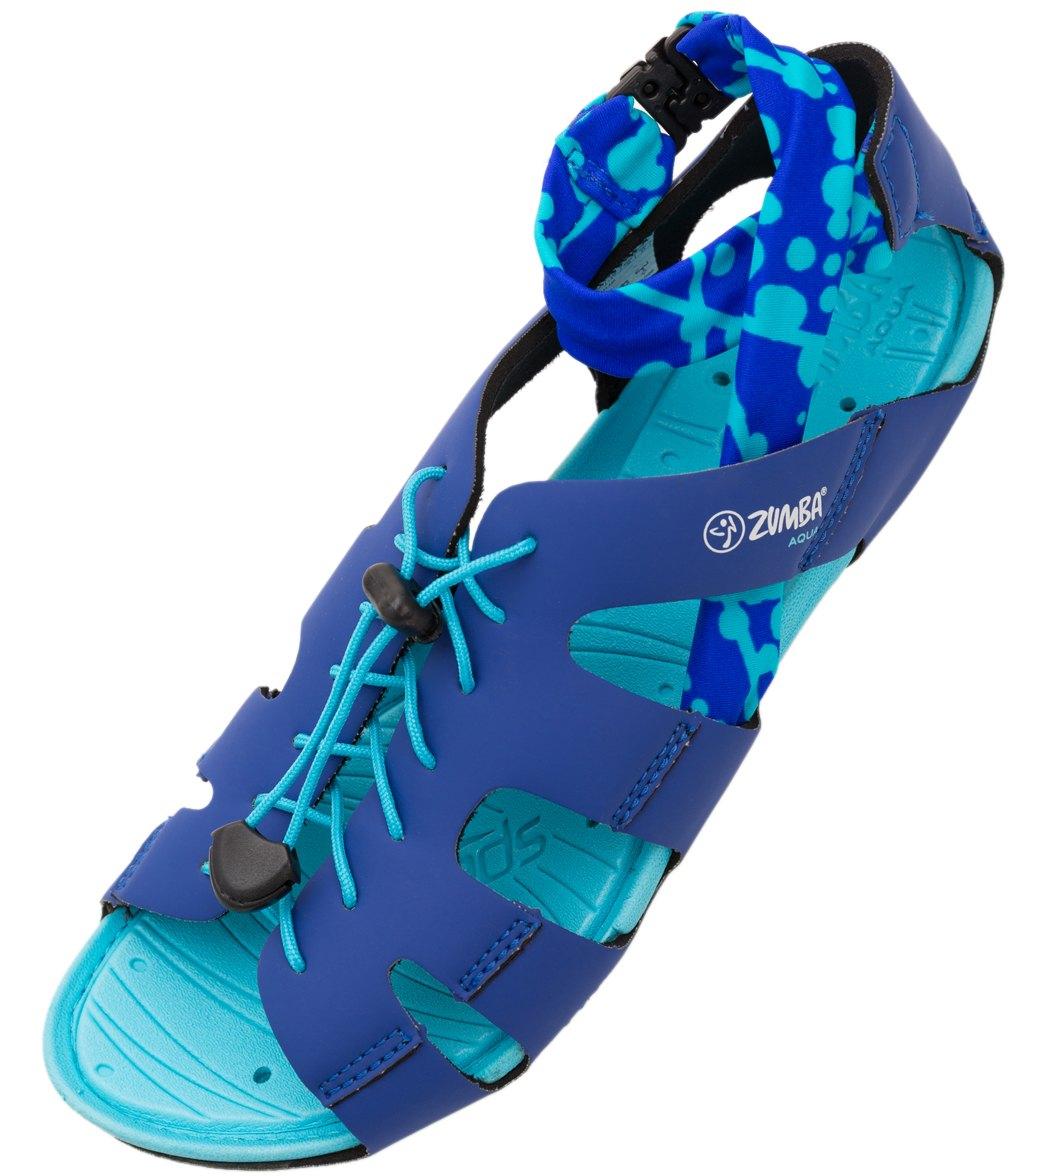 8e1585da75f8 Aqua Zumba by Speedo Wraptastic Peep Toe at SwimOutlet.com - Free Shipping